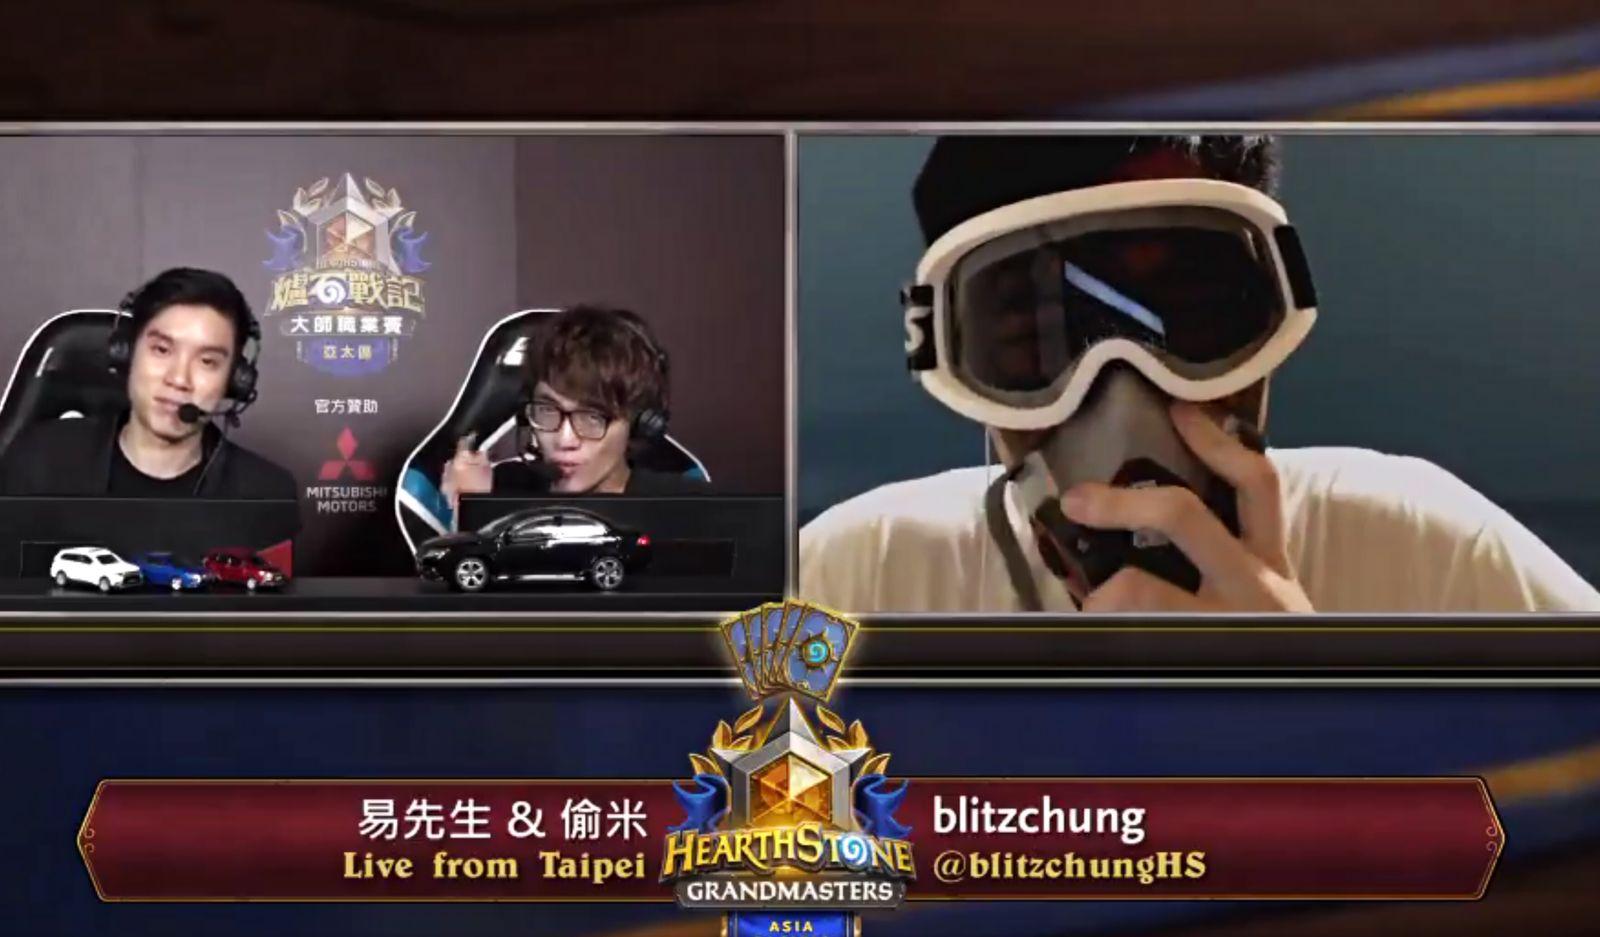 EINMALIGE VERWENDUNG NUR ALS ZITAT Blitzchung/ Chung Ng Wai